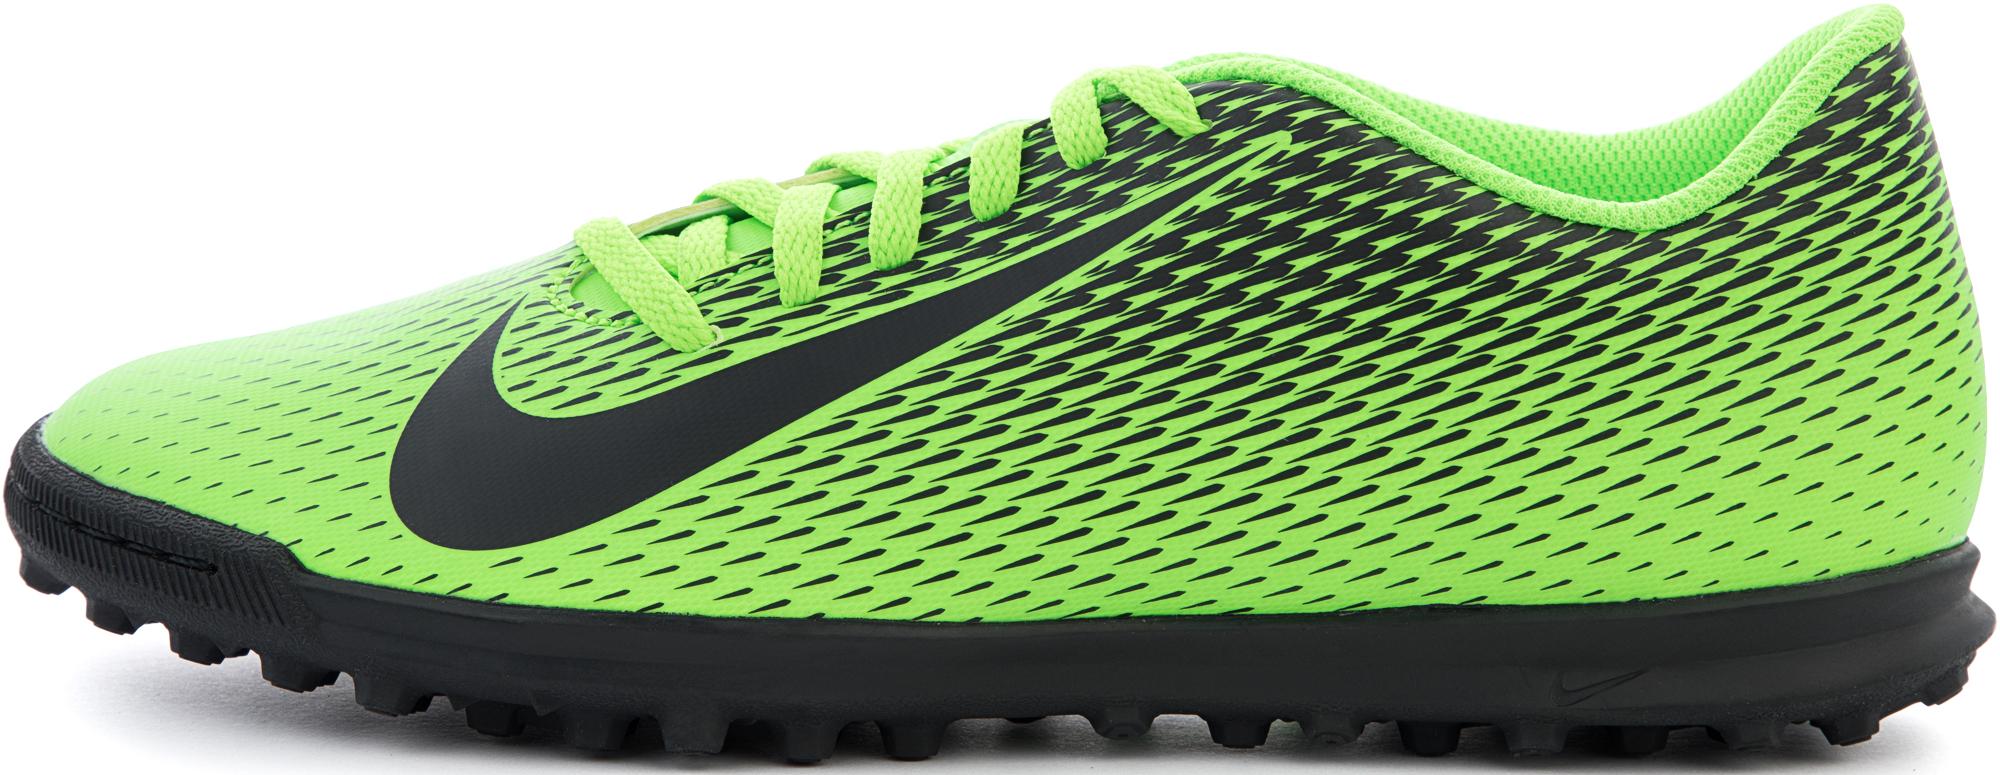 цена Nike Бутсы мужские Nike Bravatax Ii Tf, размер 46,5 онлайн в 2017 году